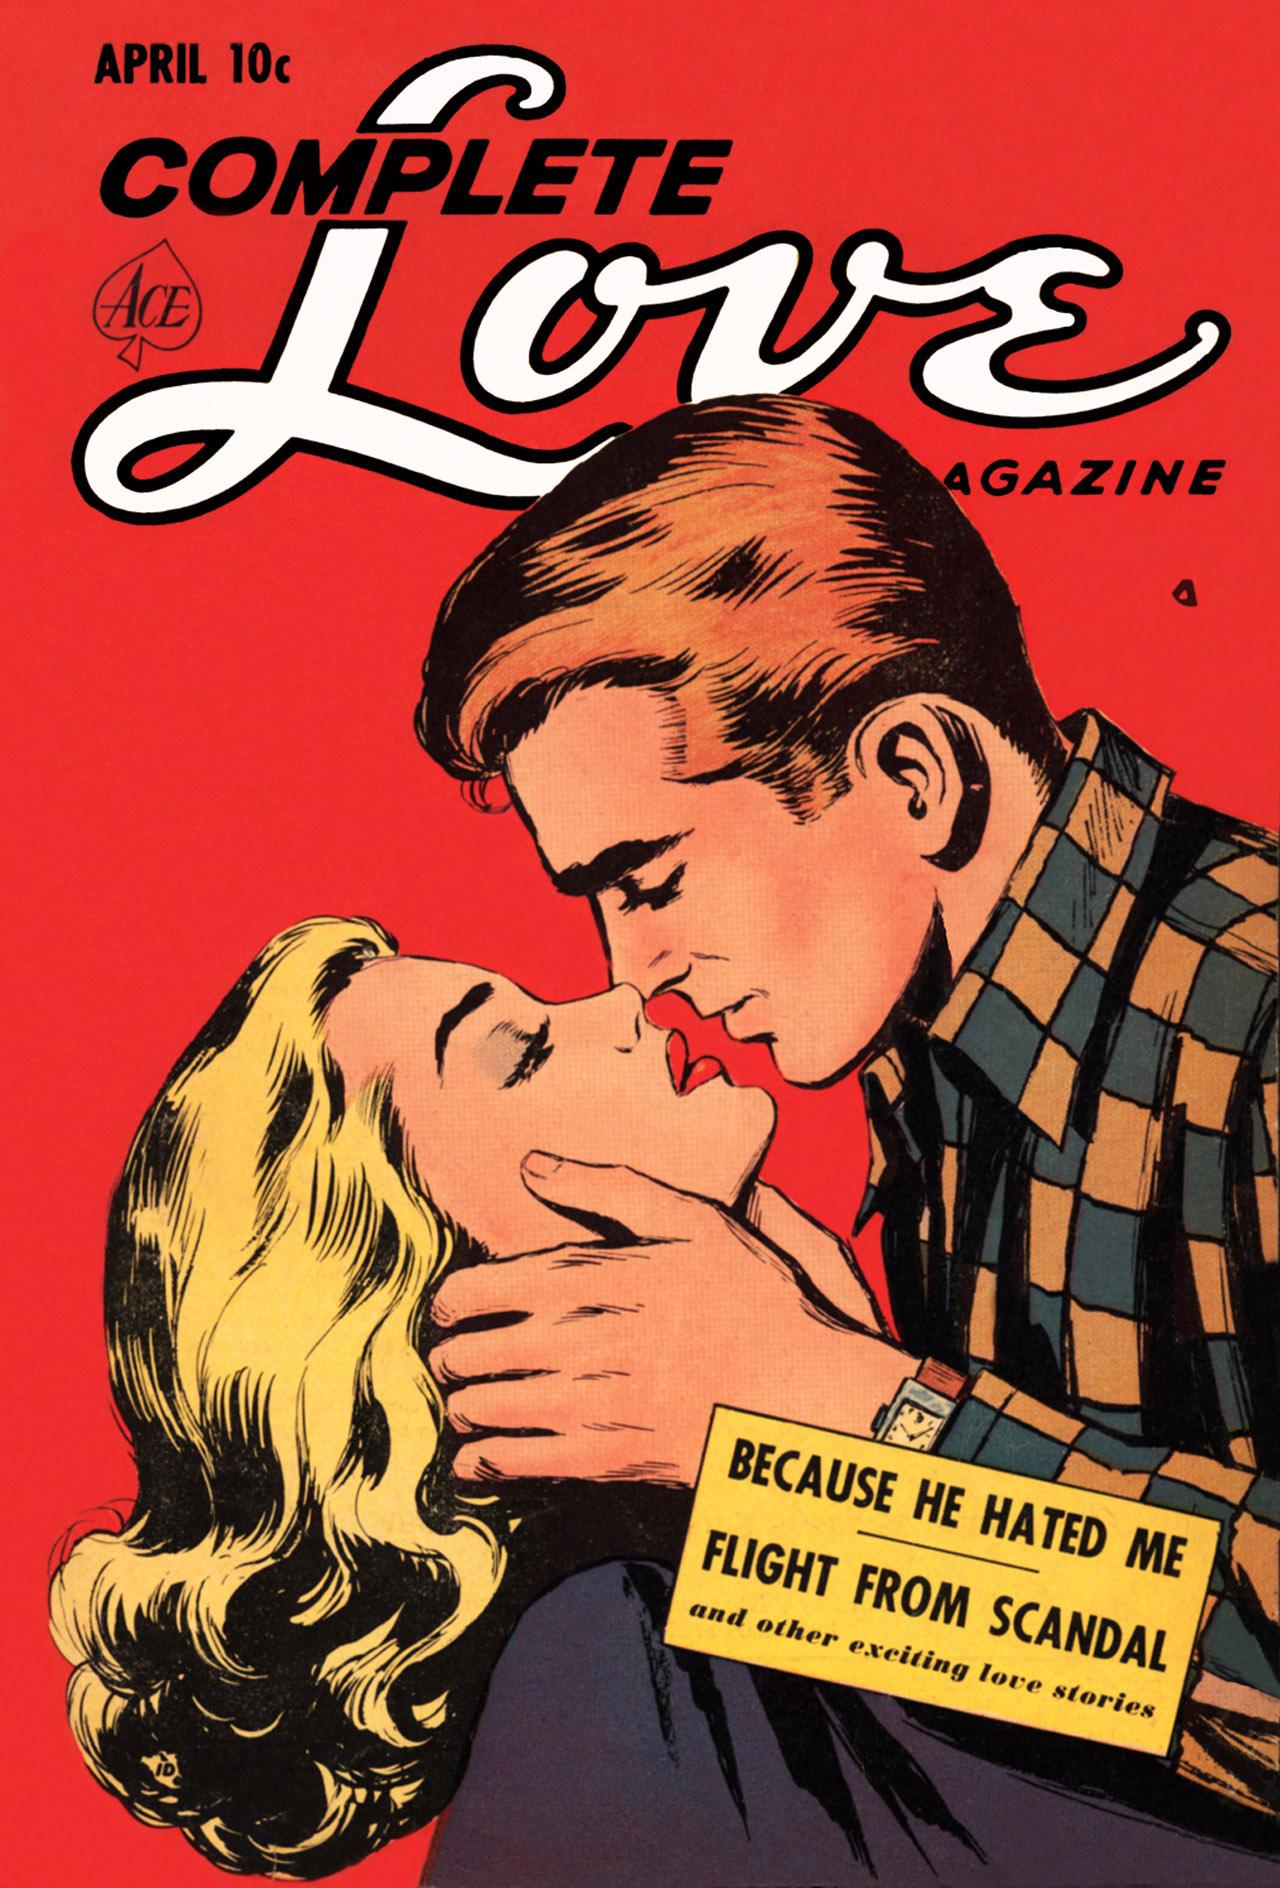 Complete Love Magazine Vol XXVII 1